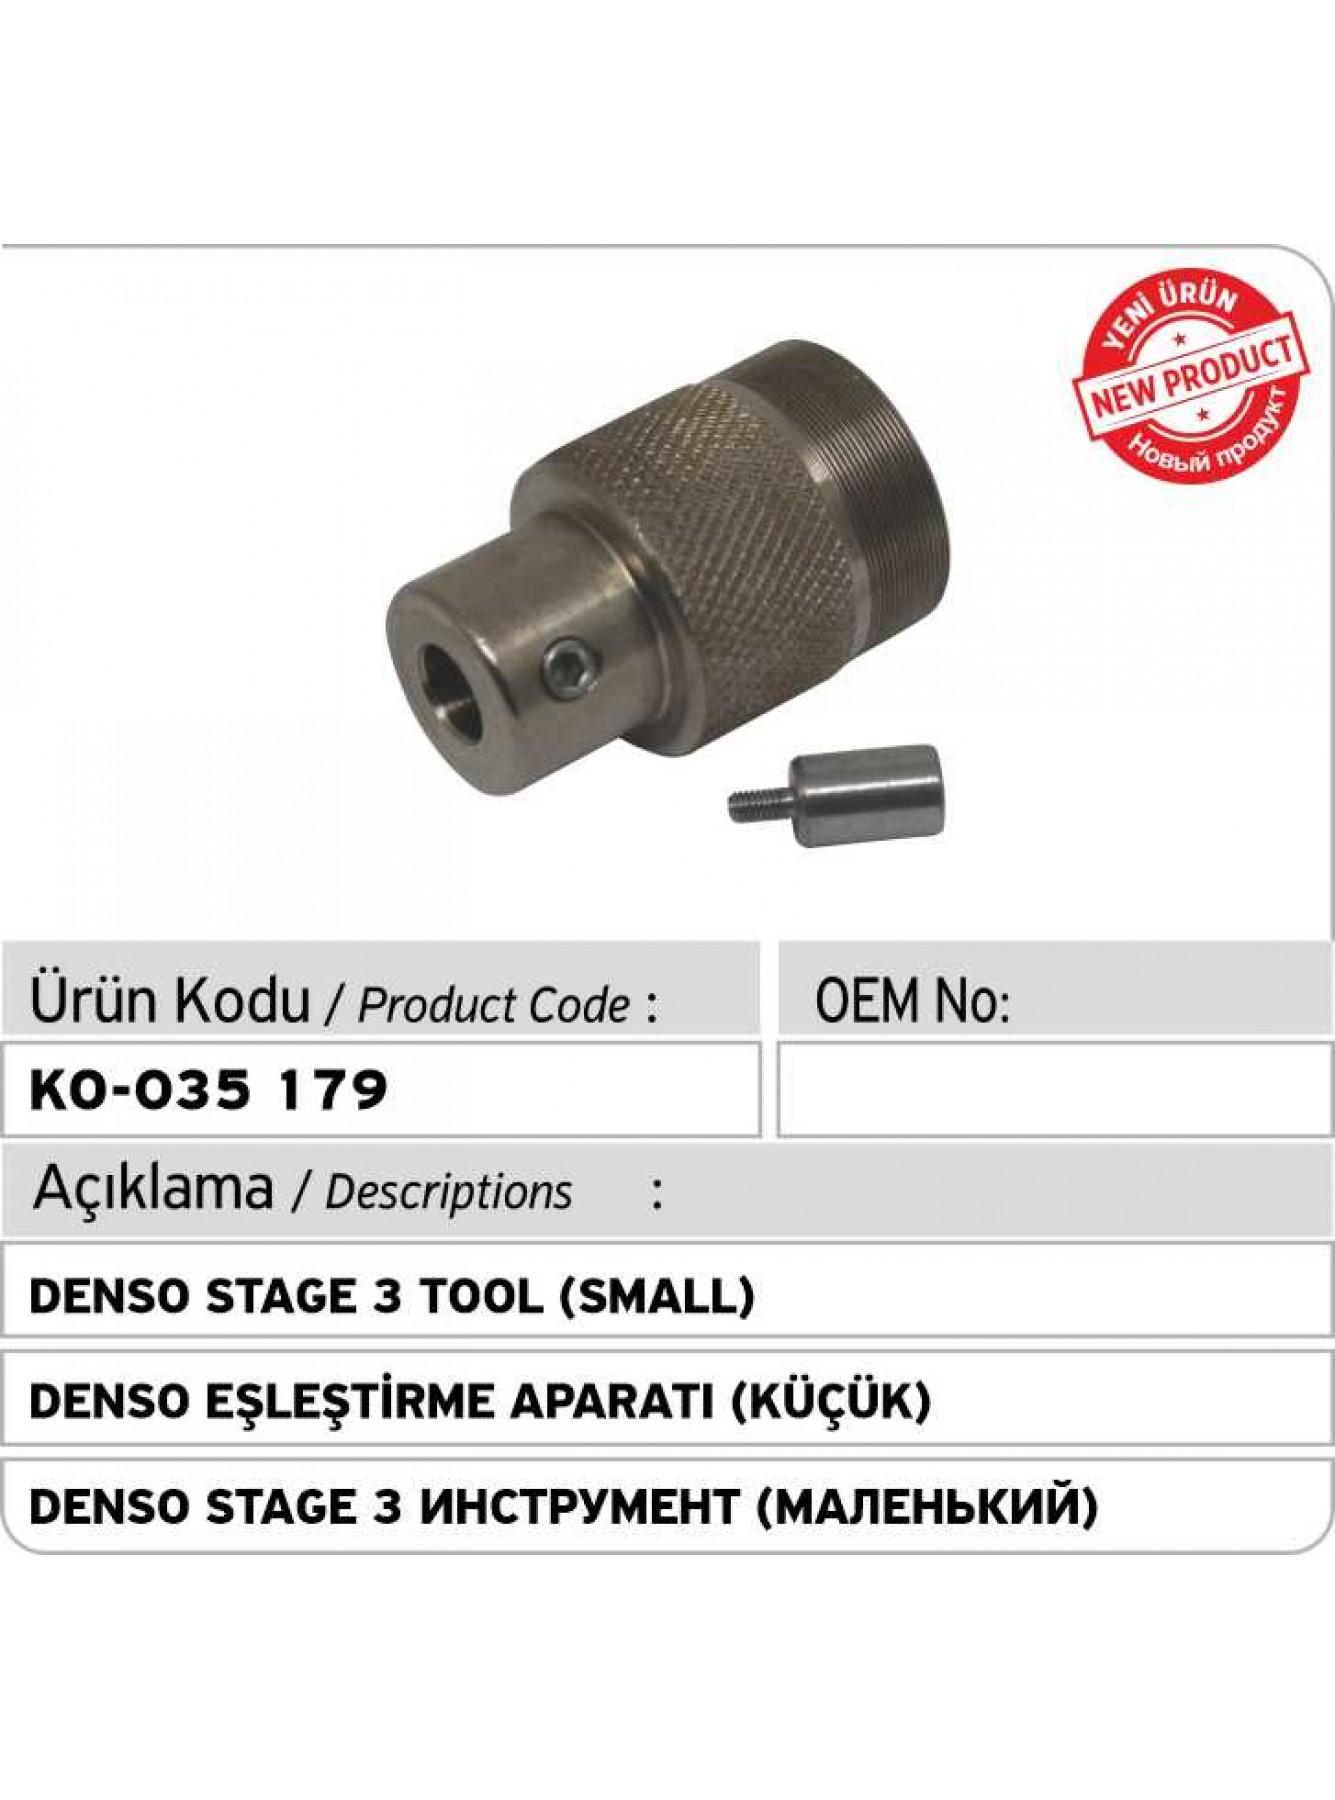 Denso Stage 3 Инструмент (маленький)